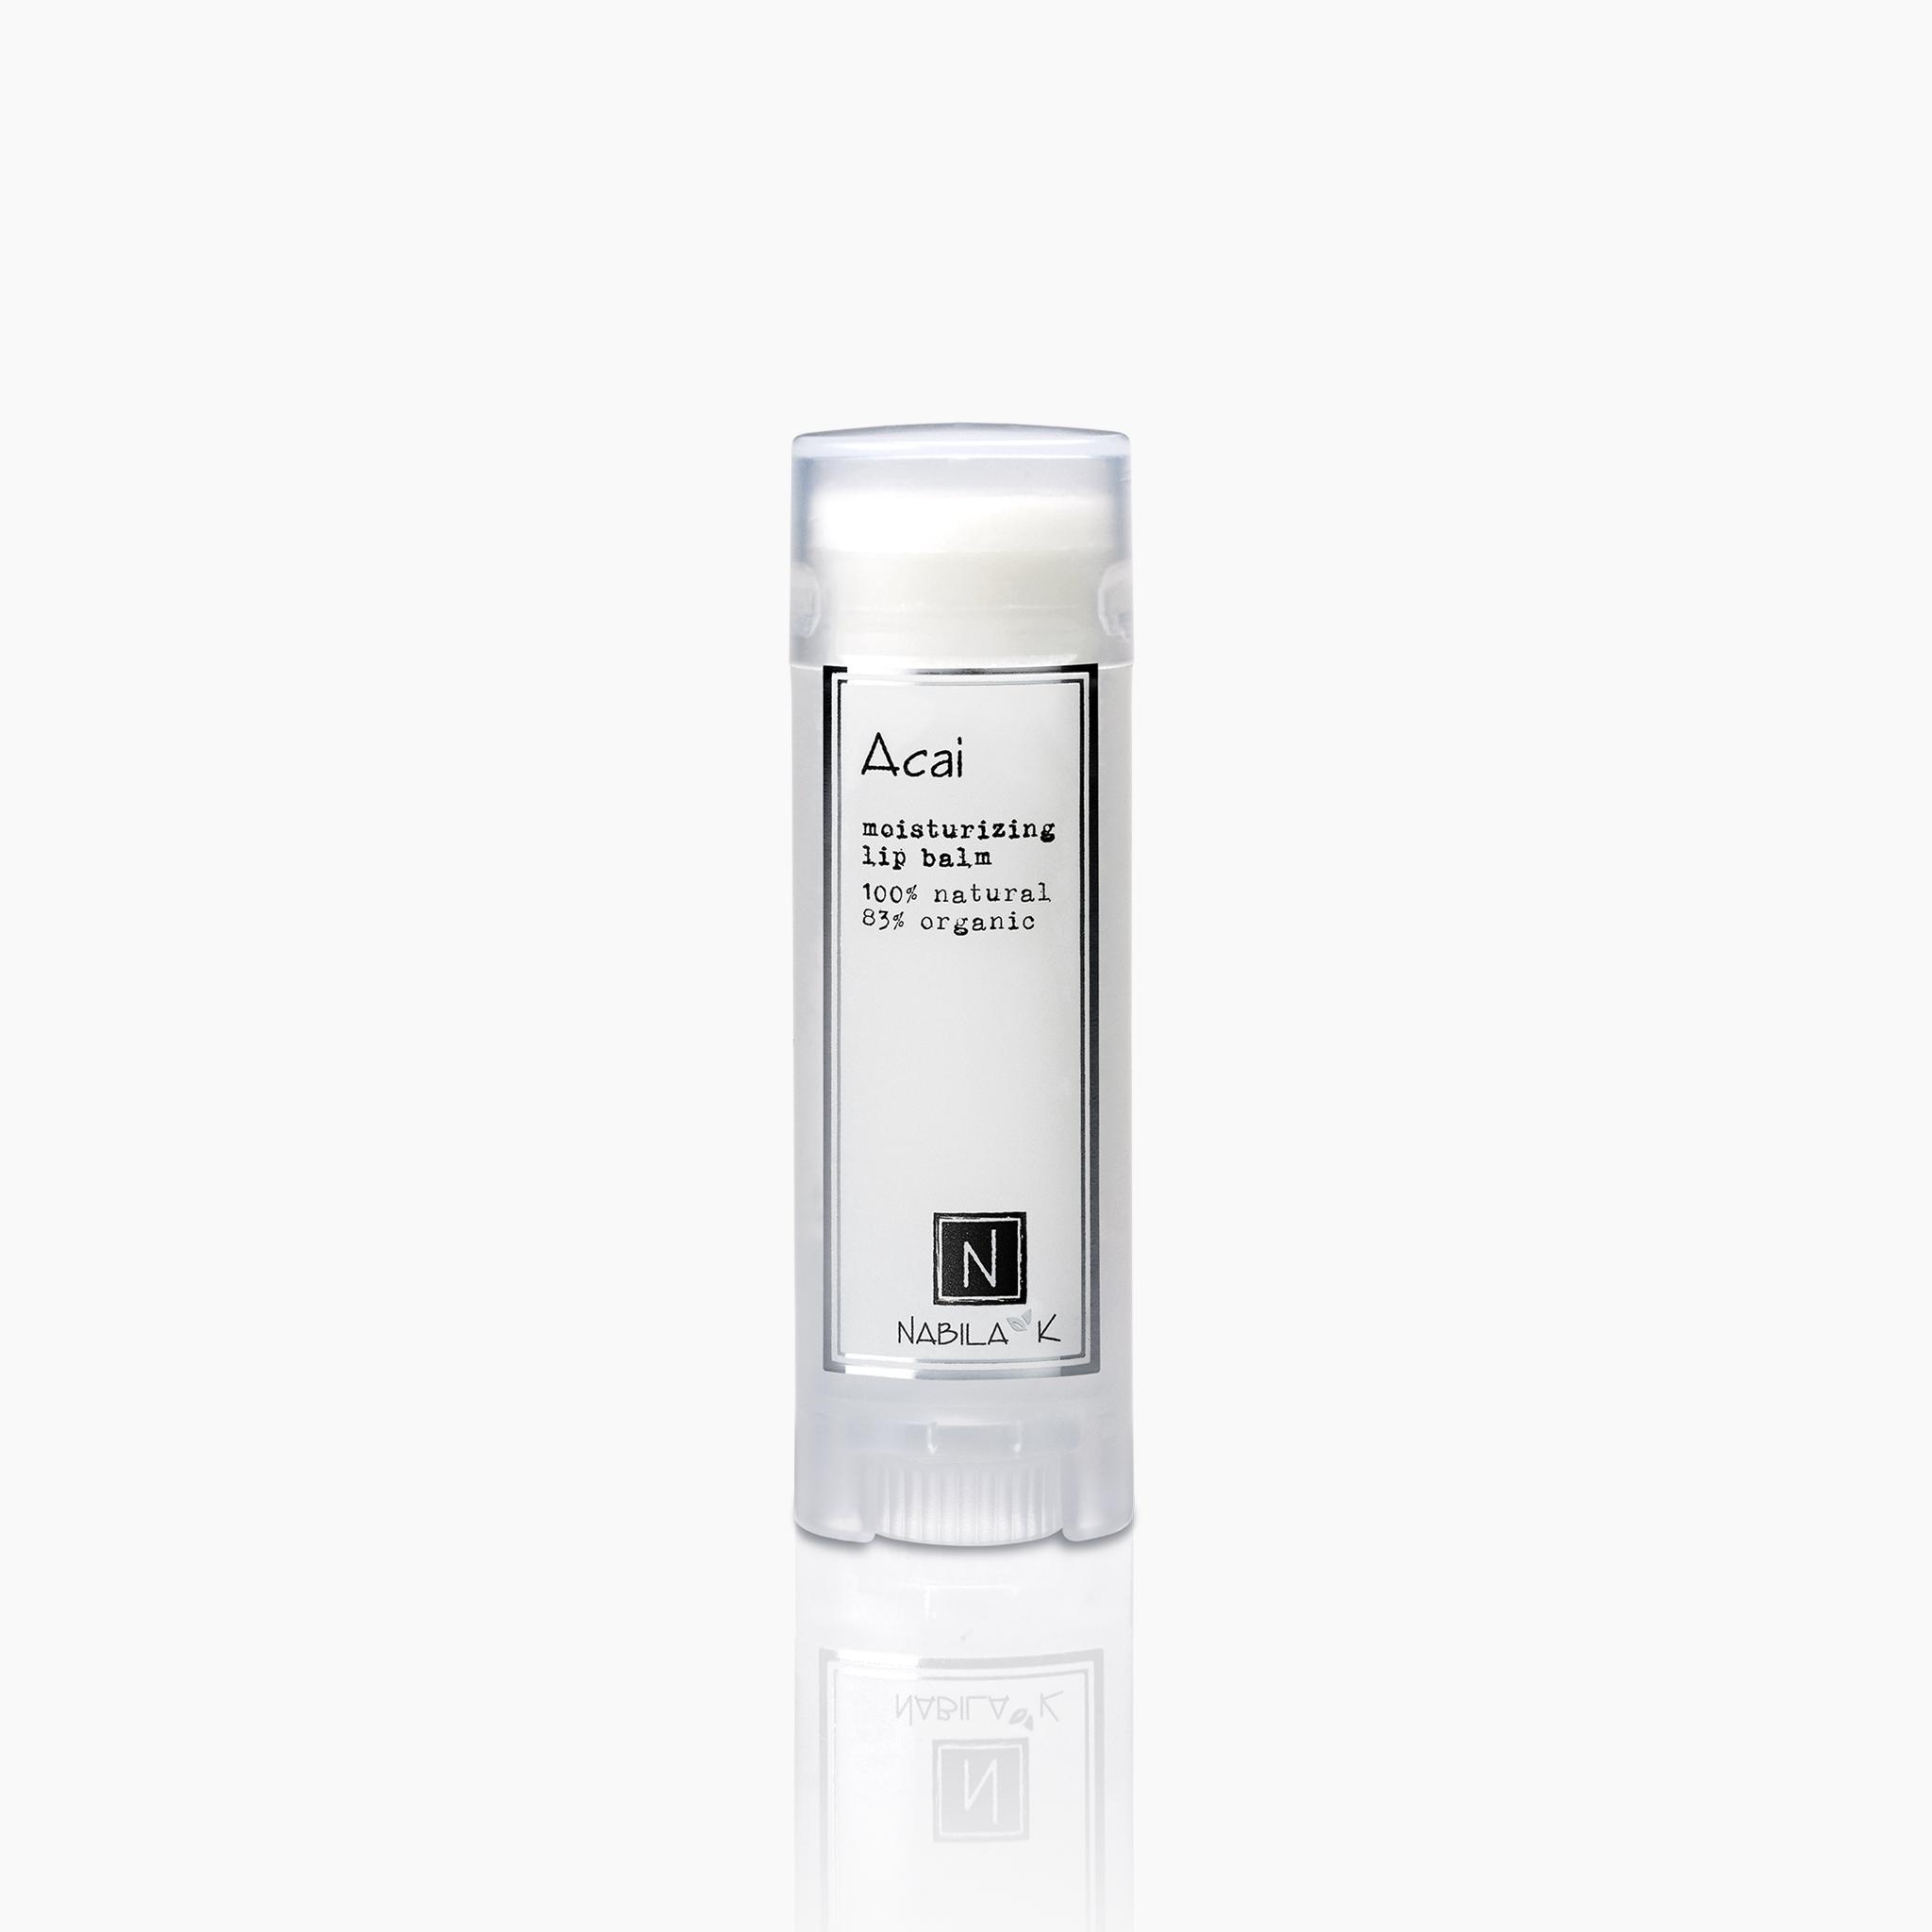 acai moisturizing lip balm 100% natural 85% organic